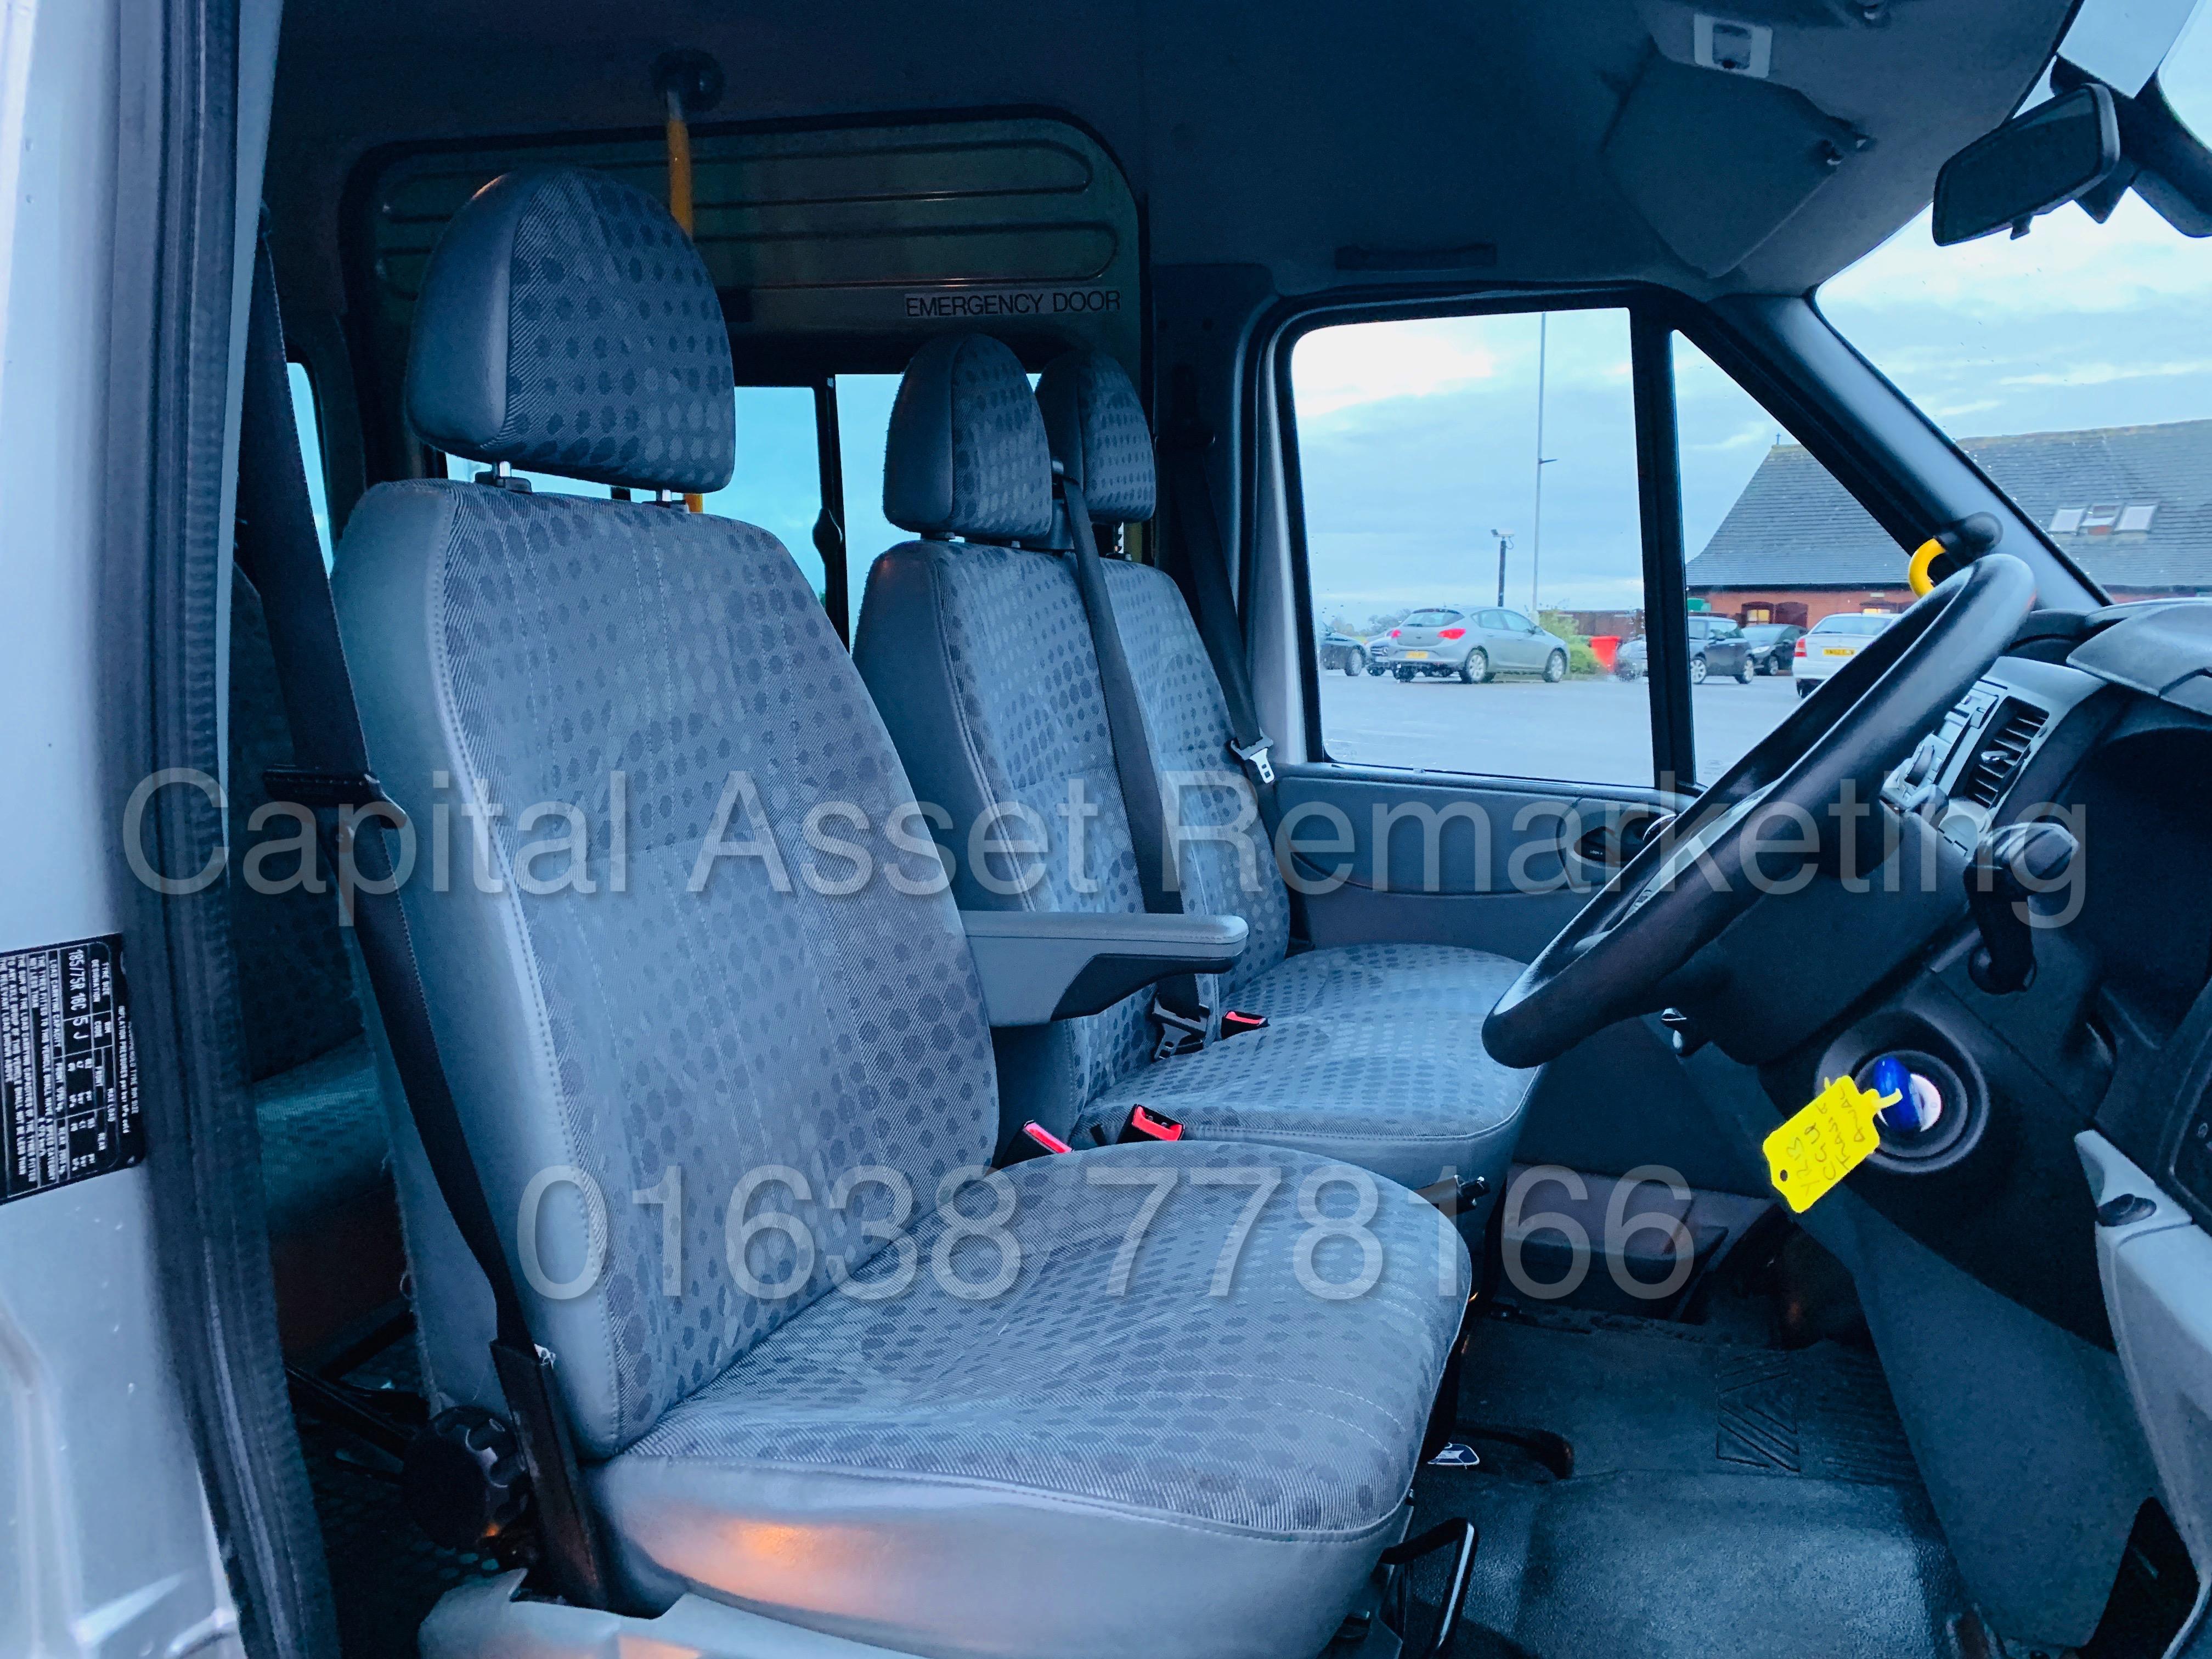 FORD TRANSIT 135 T430 RWD *XLWB -17 SEATER MINI-BUS* (2013) '2.2 TDCI - 135 BHP - 6 SPEED' (1 OWNER) - Image 29 of 43